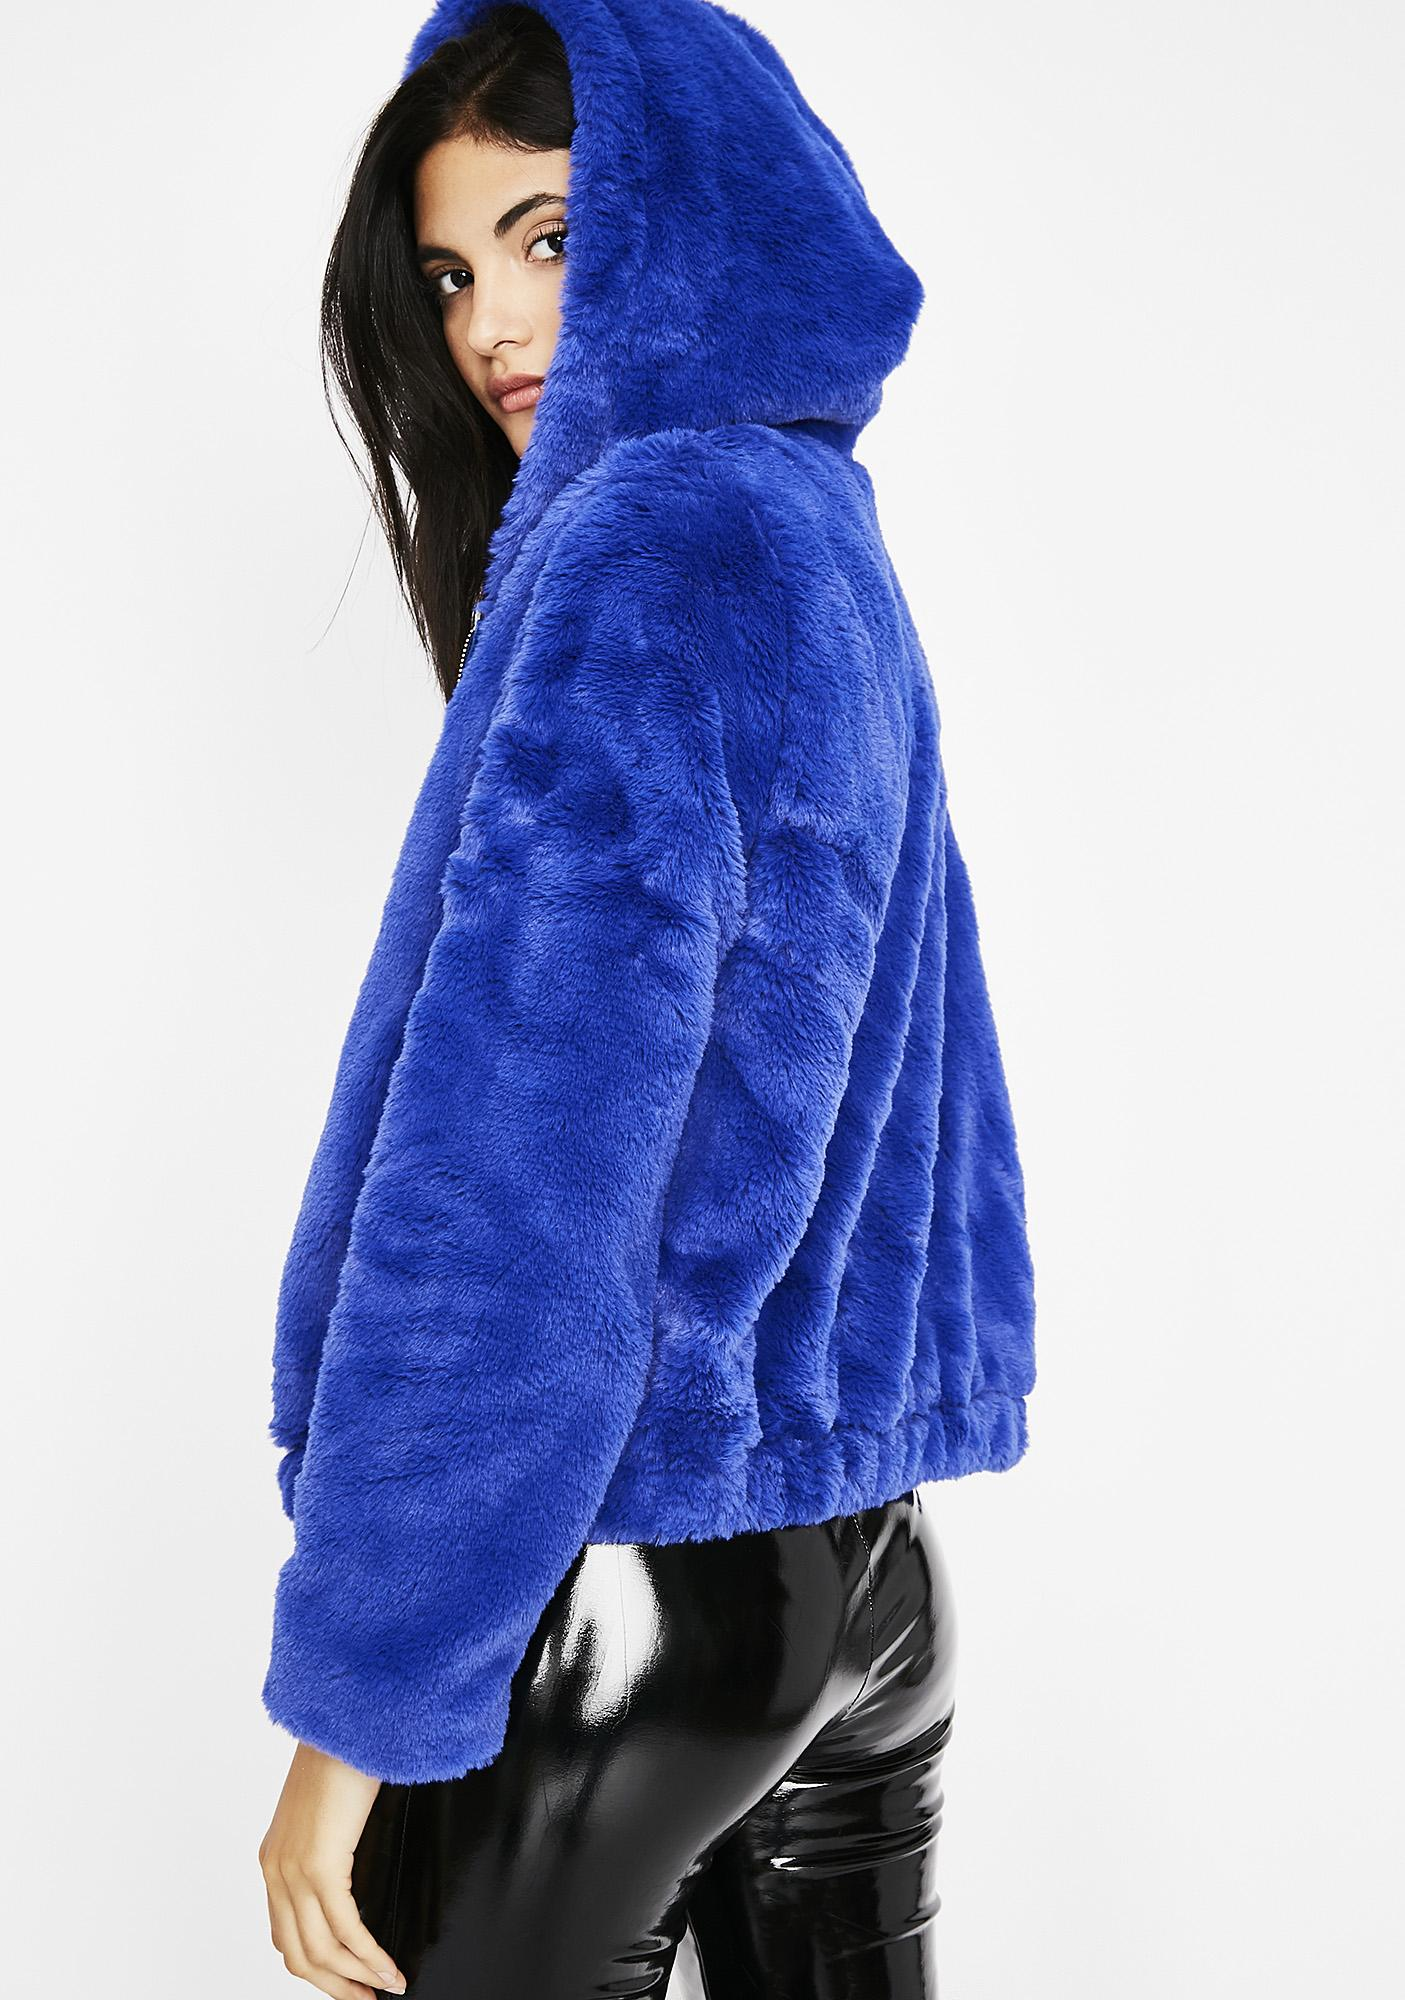 Royal Feel Me Up Furry Jacket